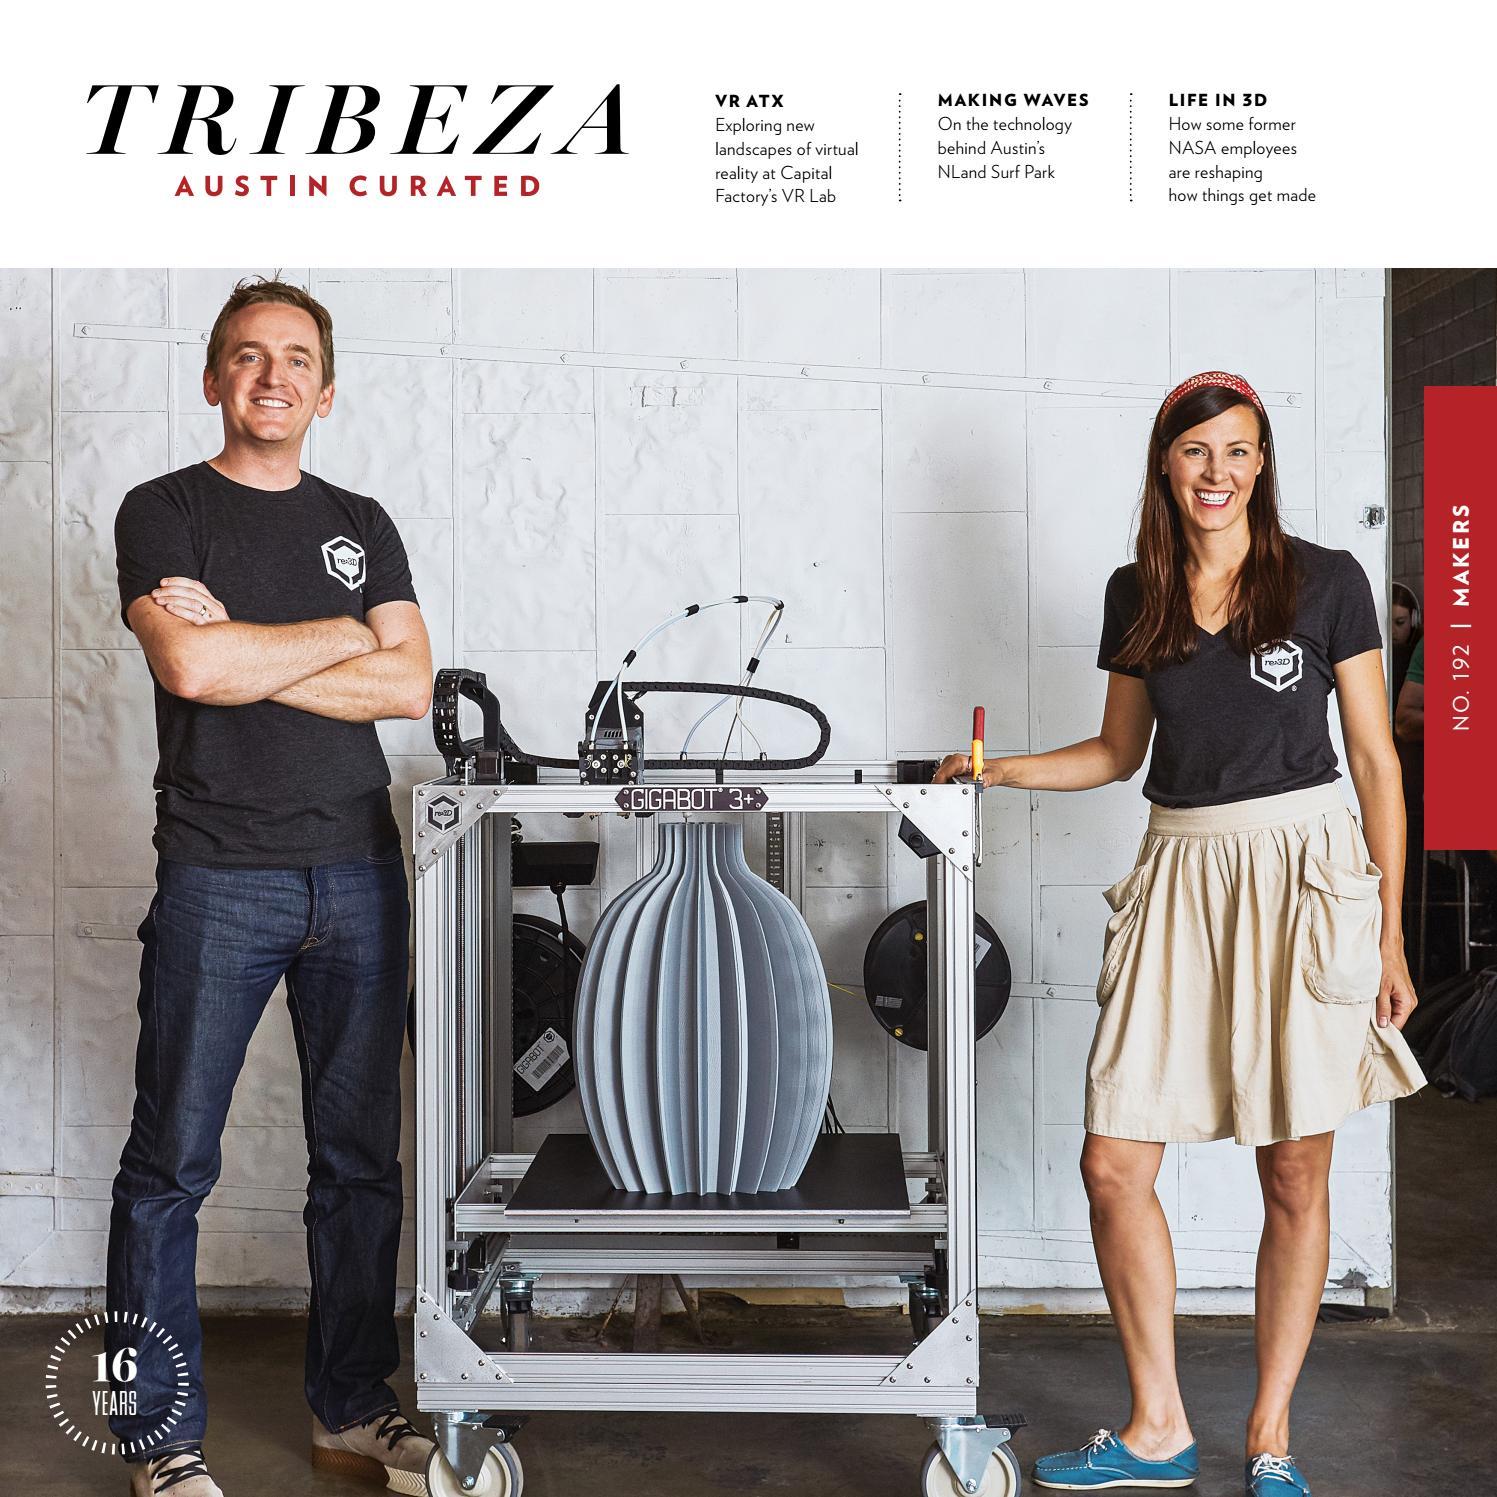 c918ac08af9 TRIBEZA August 2017 by TRIBEZA Austin Curated - issuu